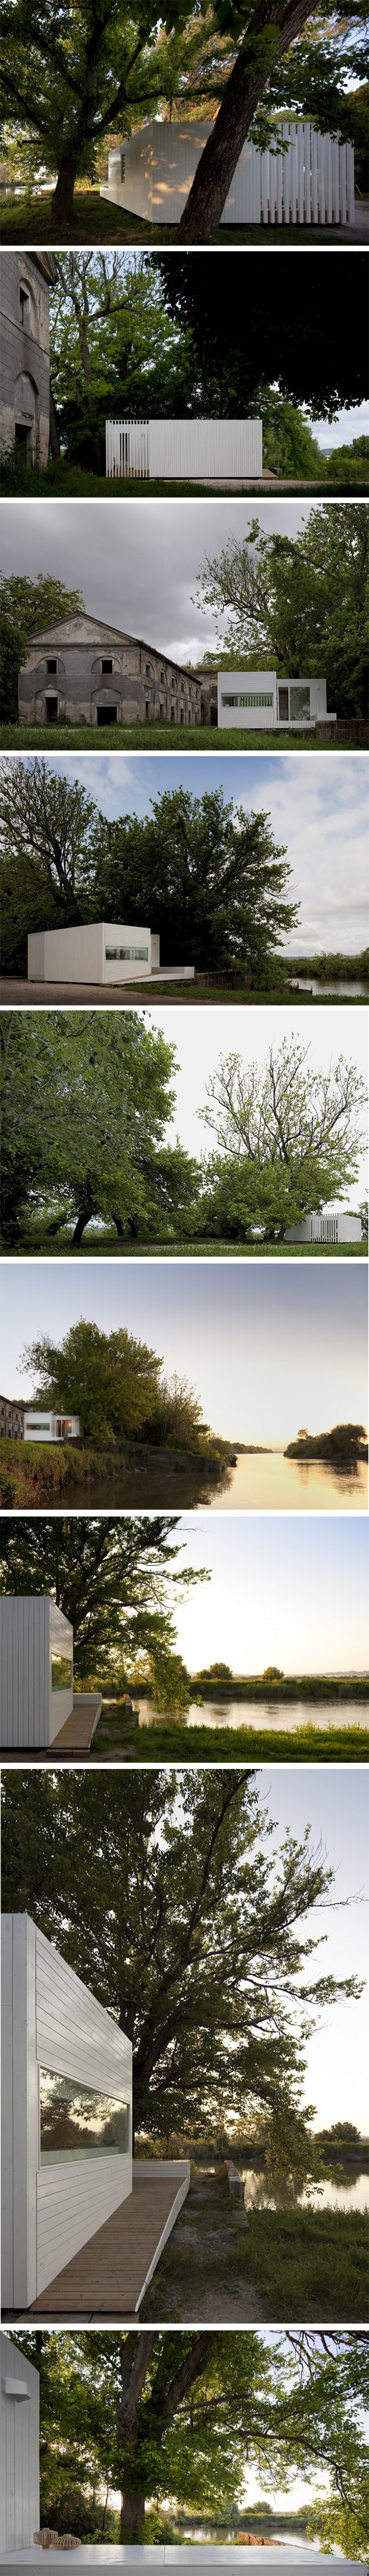 Exterior de la treehouse en Portugal